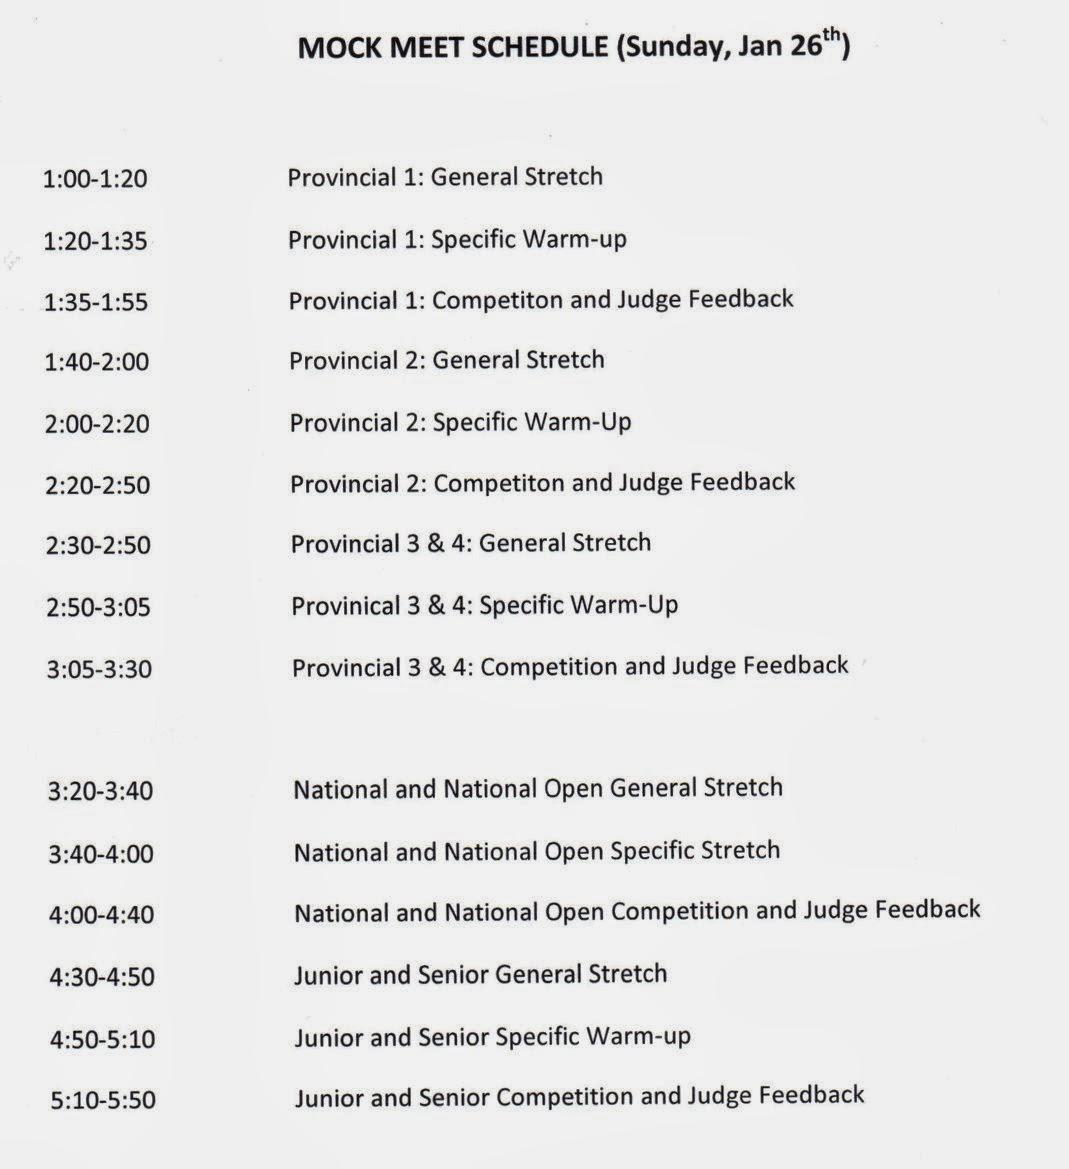 oakville gymnastics club tumbling program mock meet schedule sun